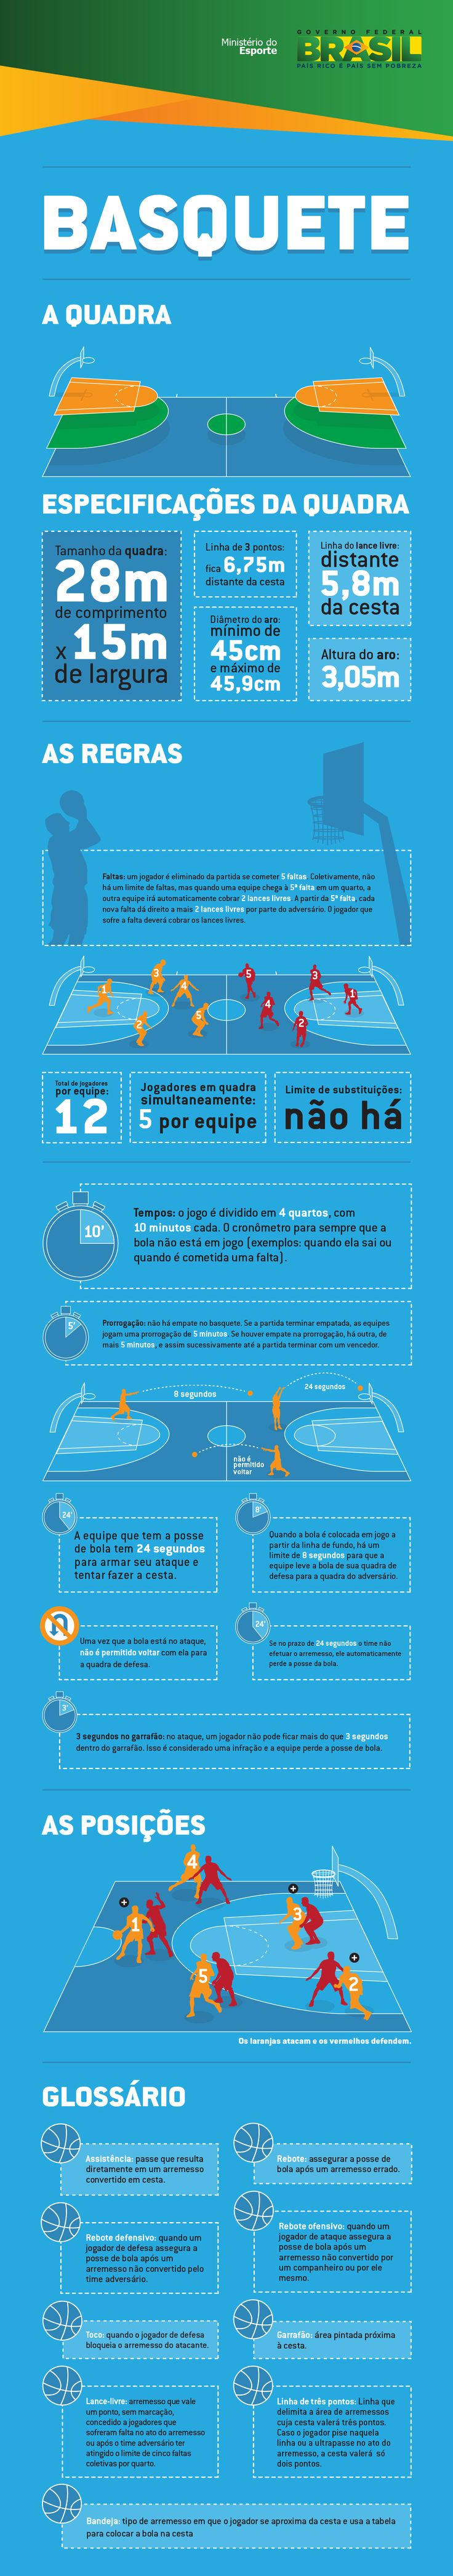 Basquete — Portal Brasil 2016